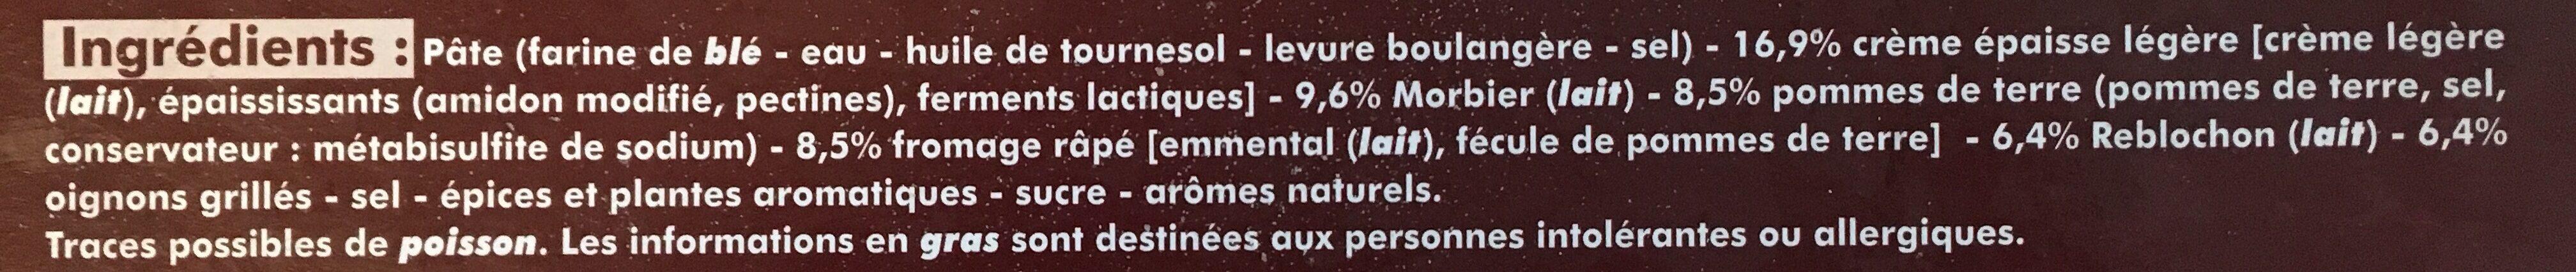 Pizza montagnarde - Ingredients